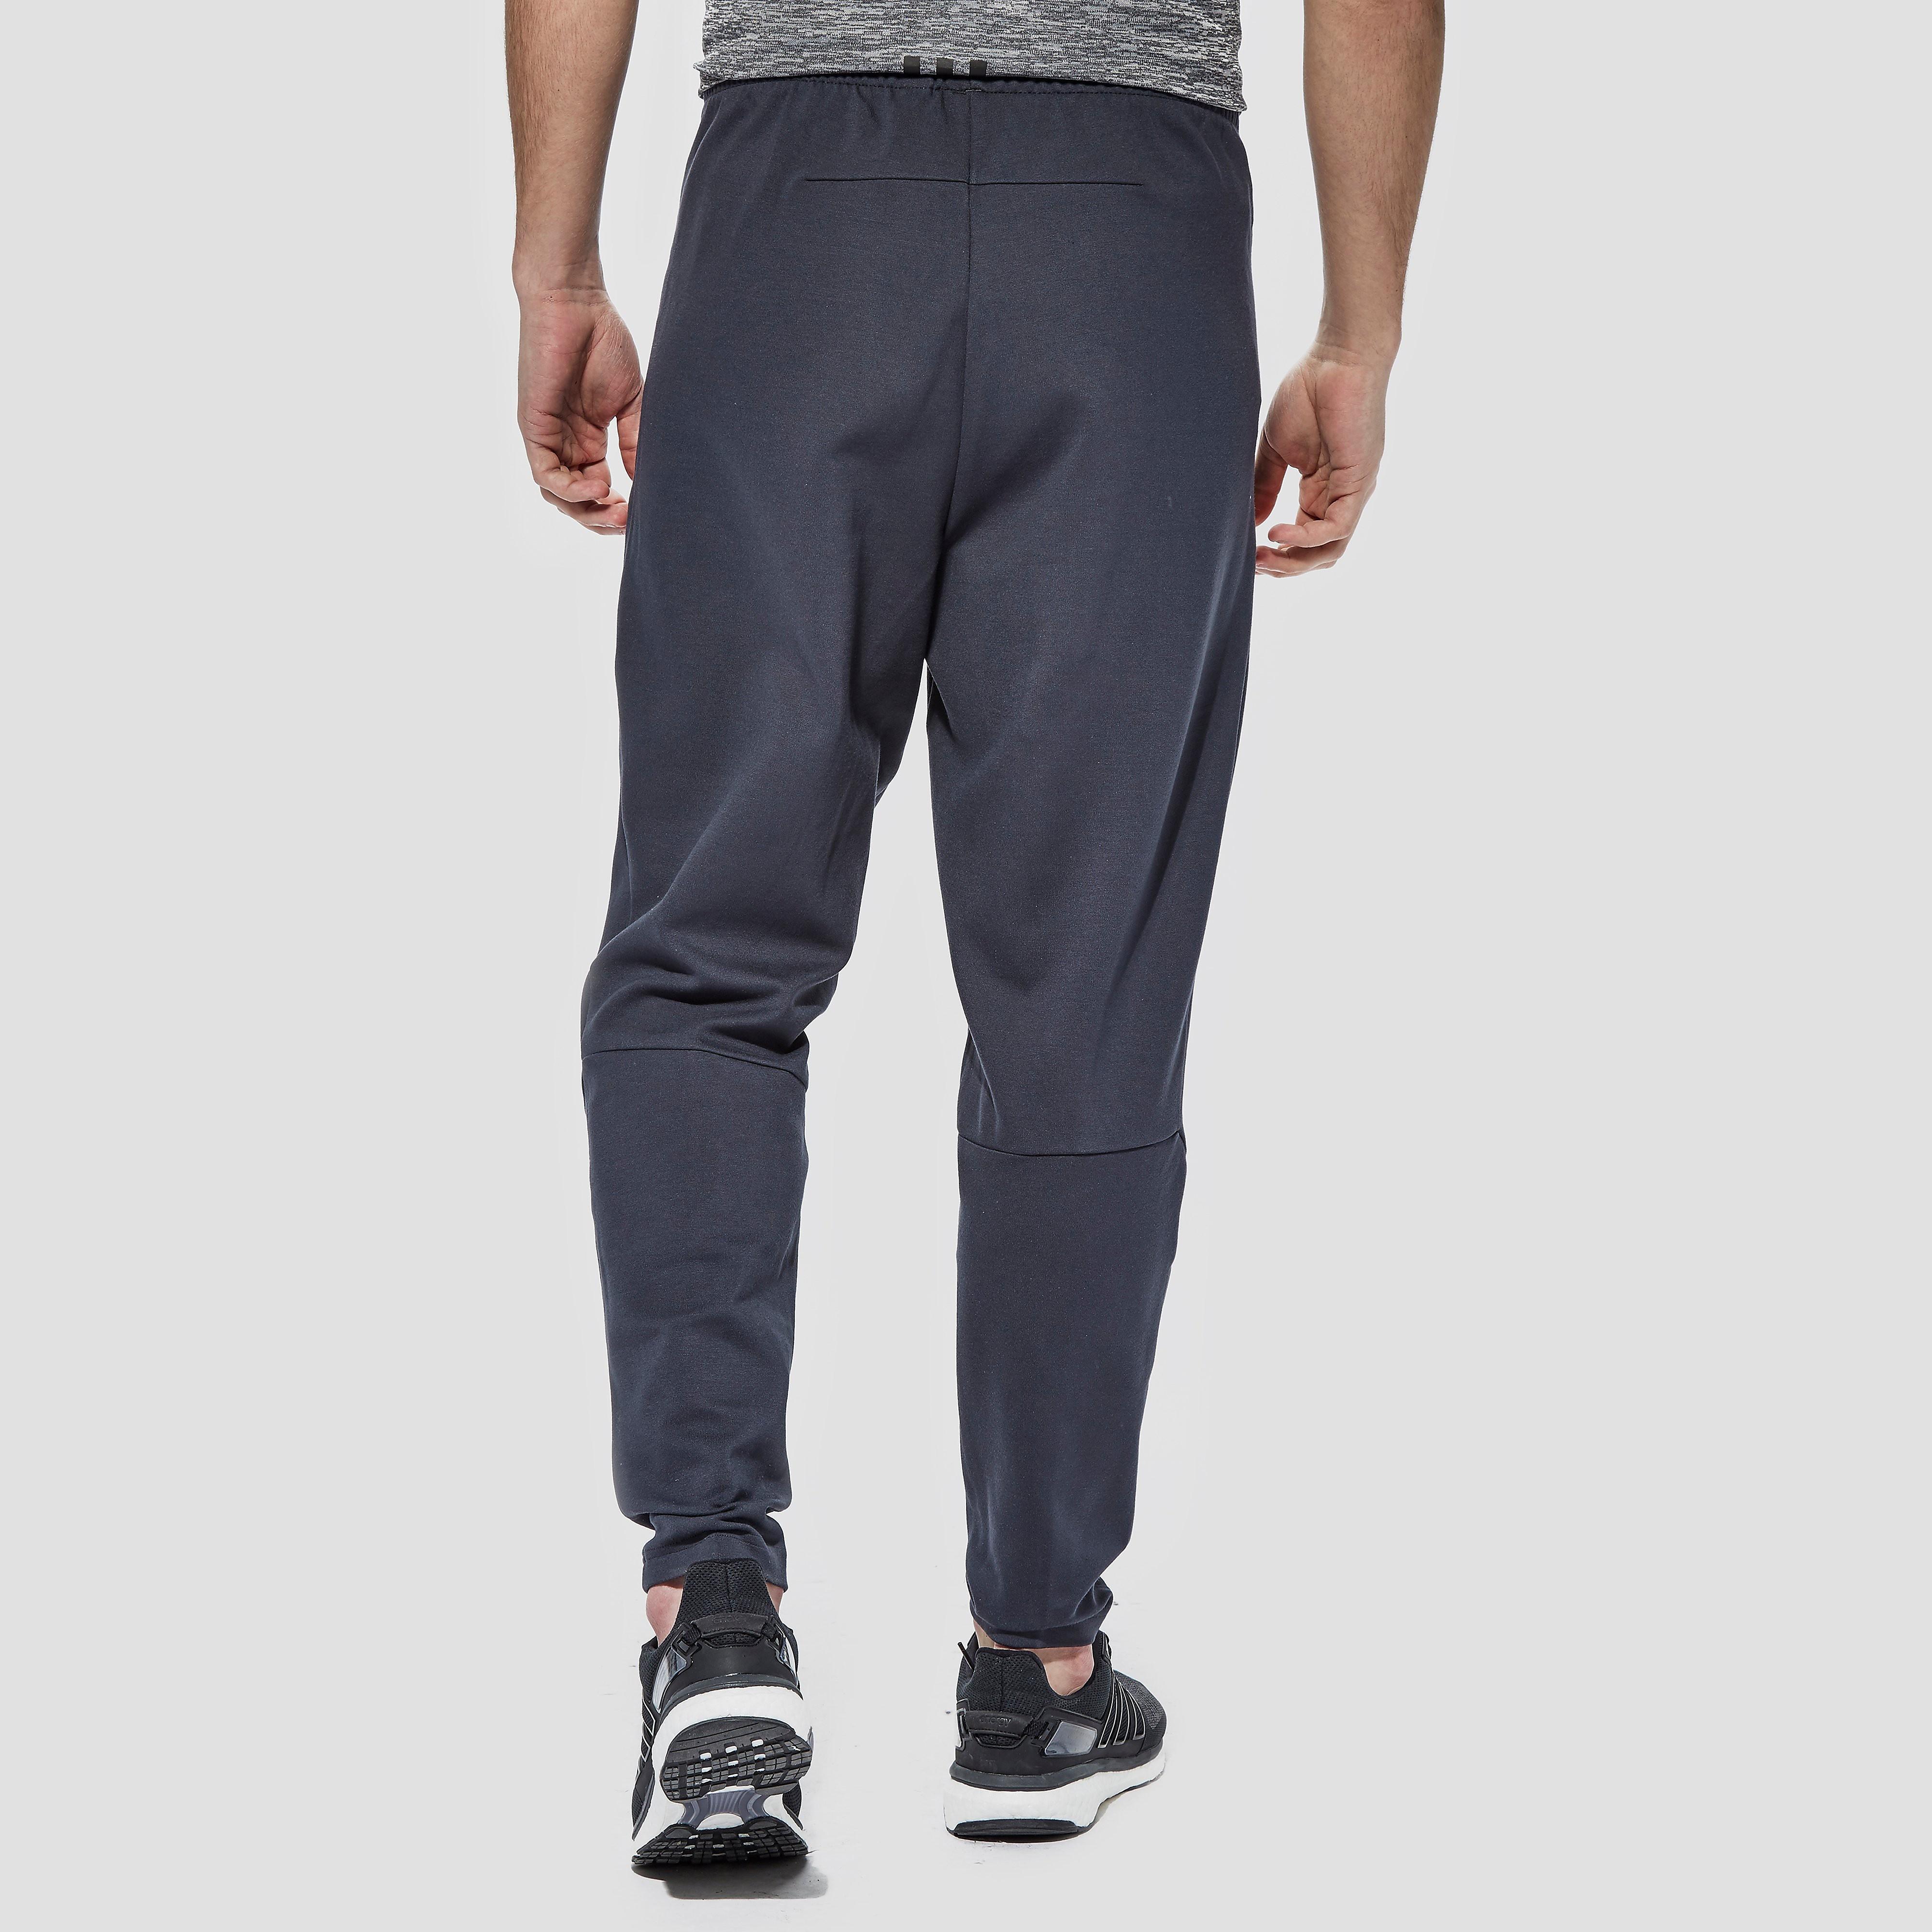 adidas Z.N.E Melbourne Men's Tennis Pants